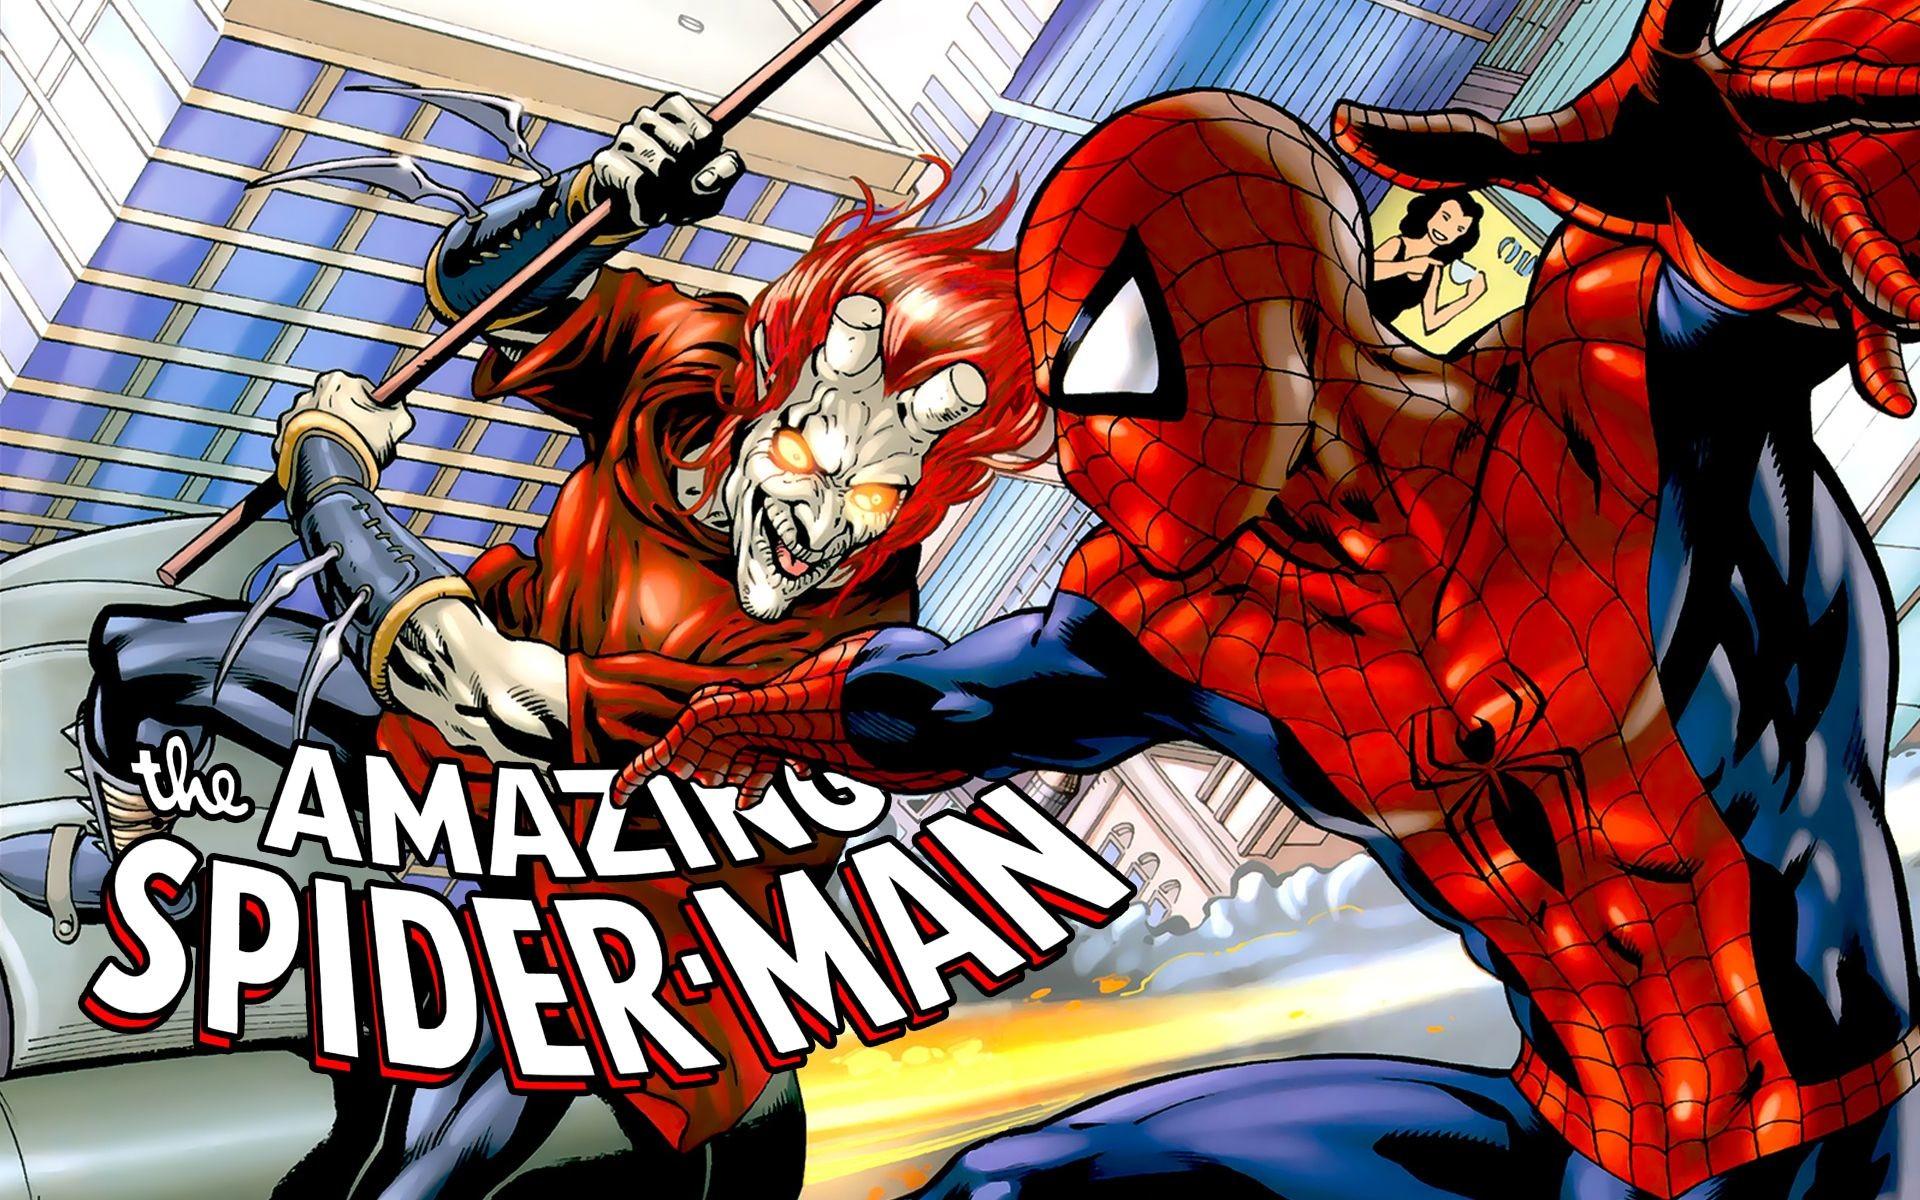 Comics Spider-Man masks Ultimate Spider-Man wallpaper